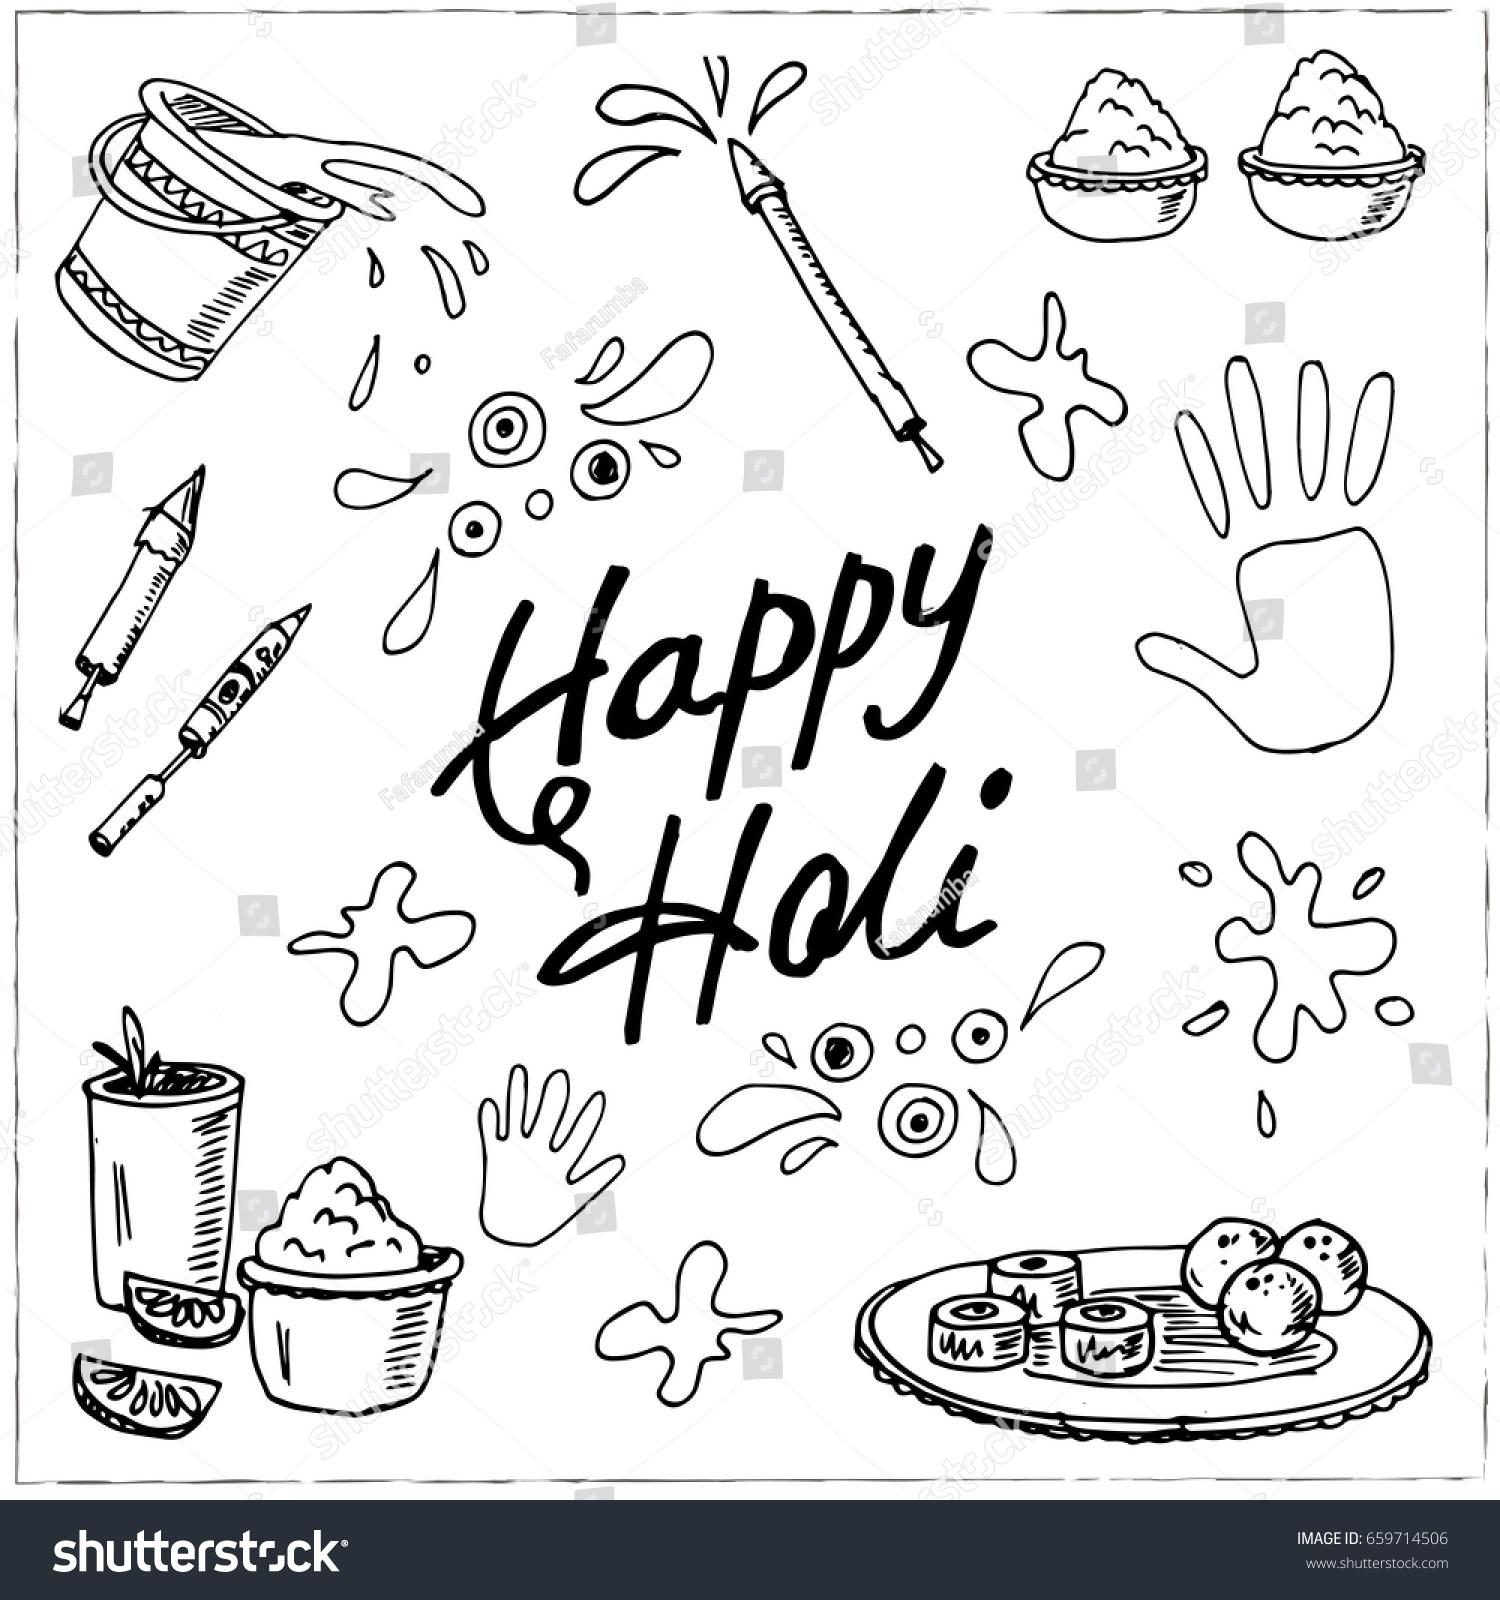 Holi clipart black and white 7 » Clipart Portal.